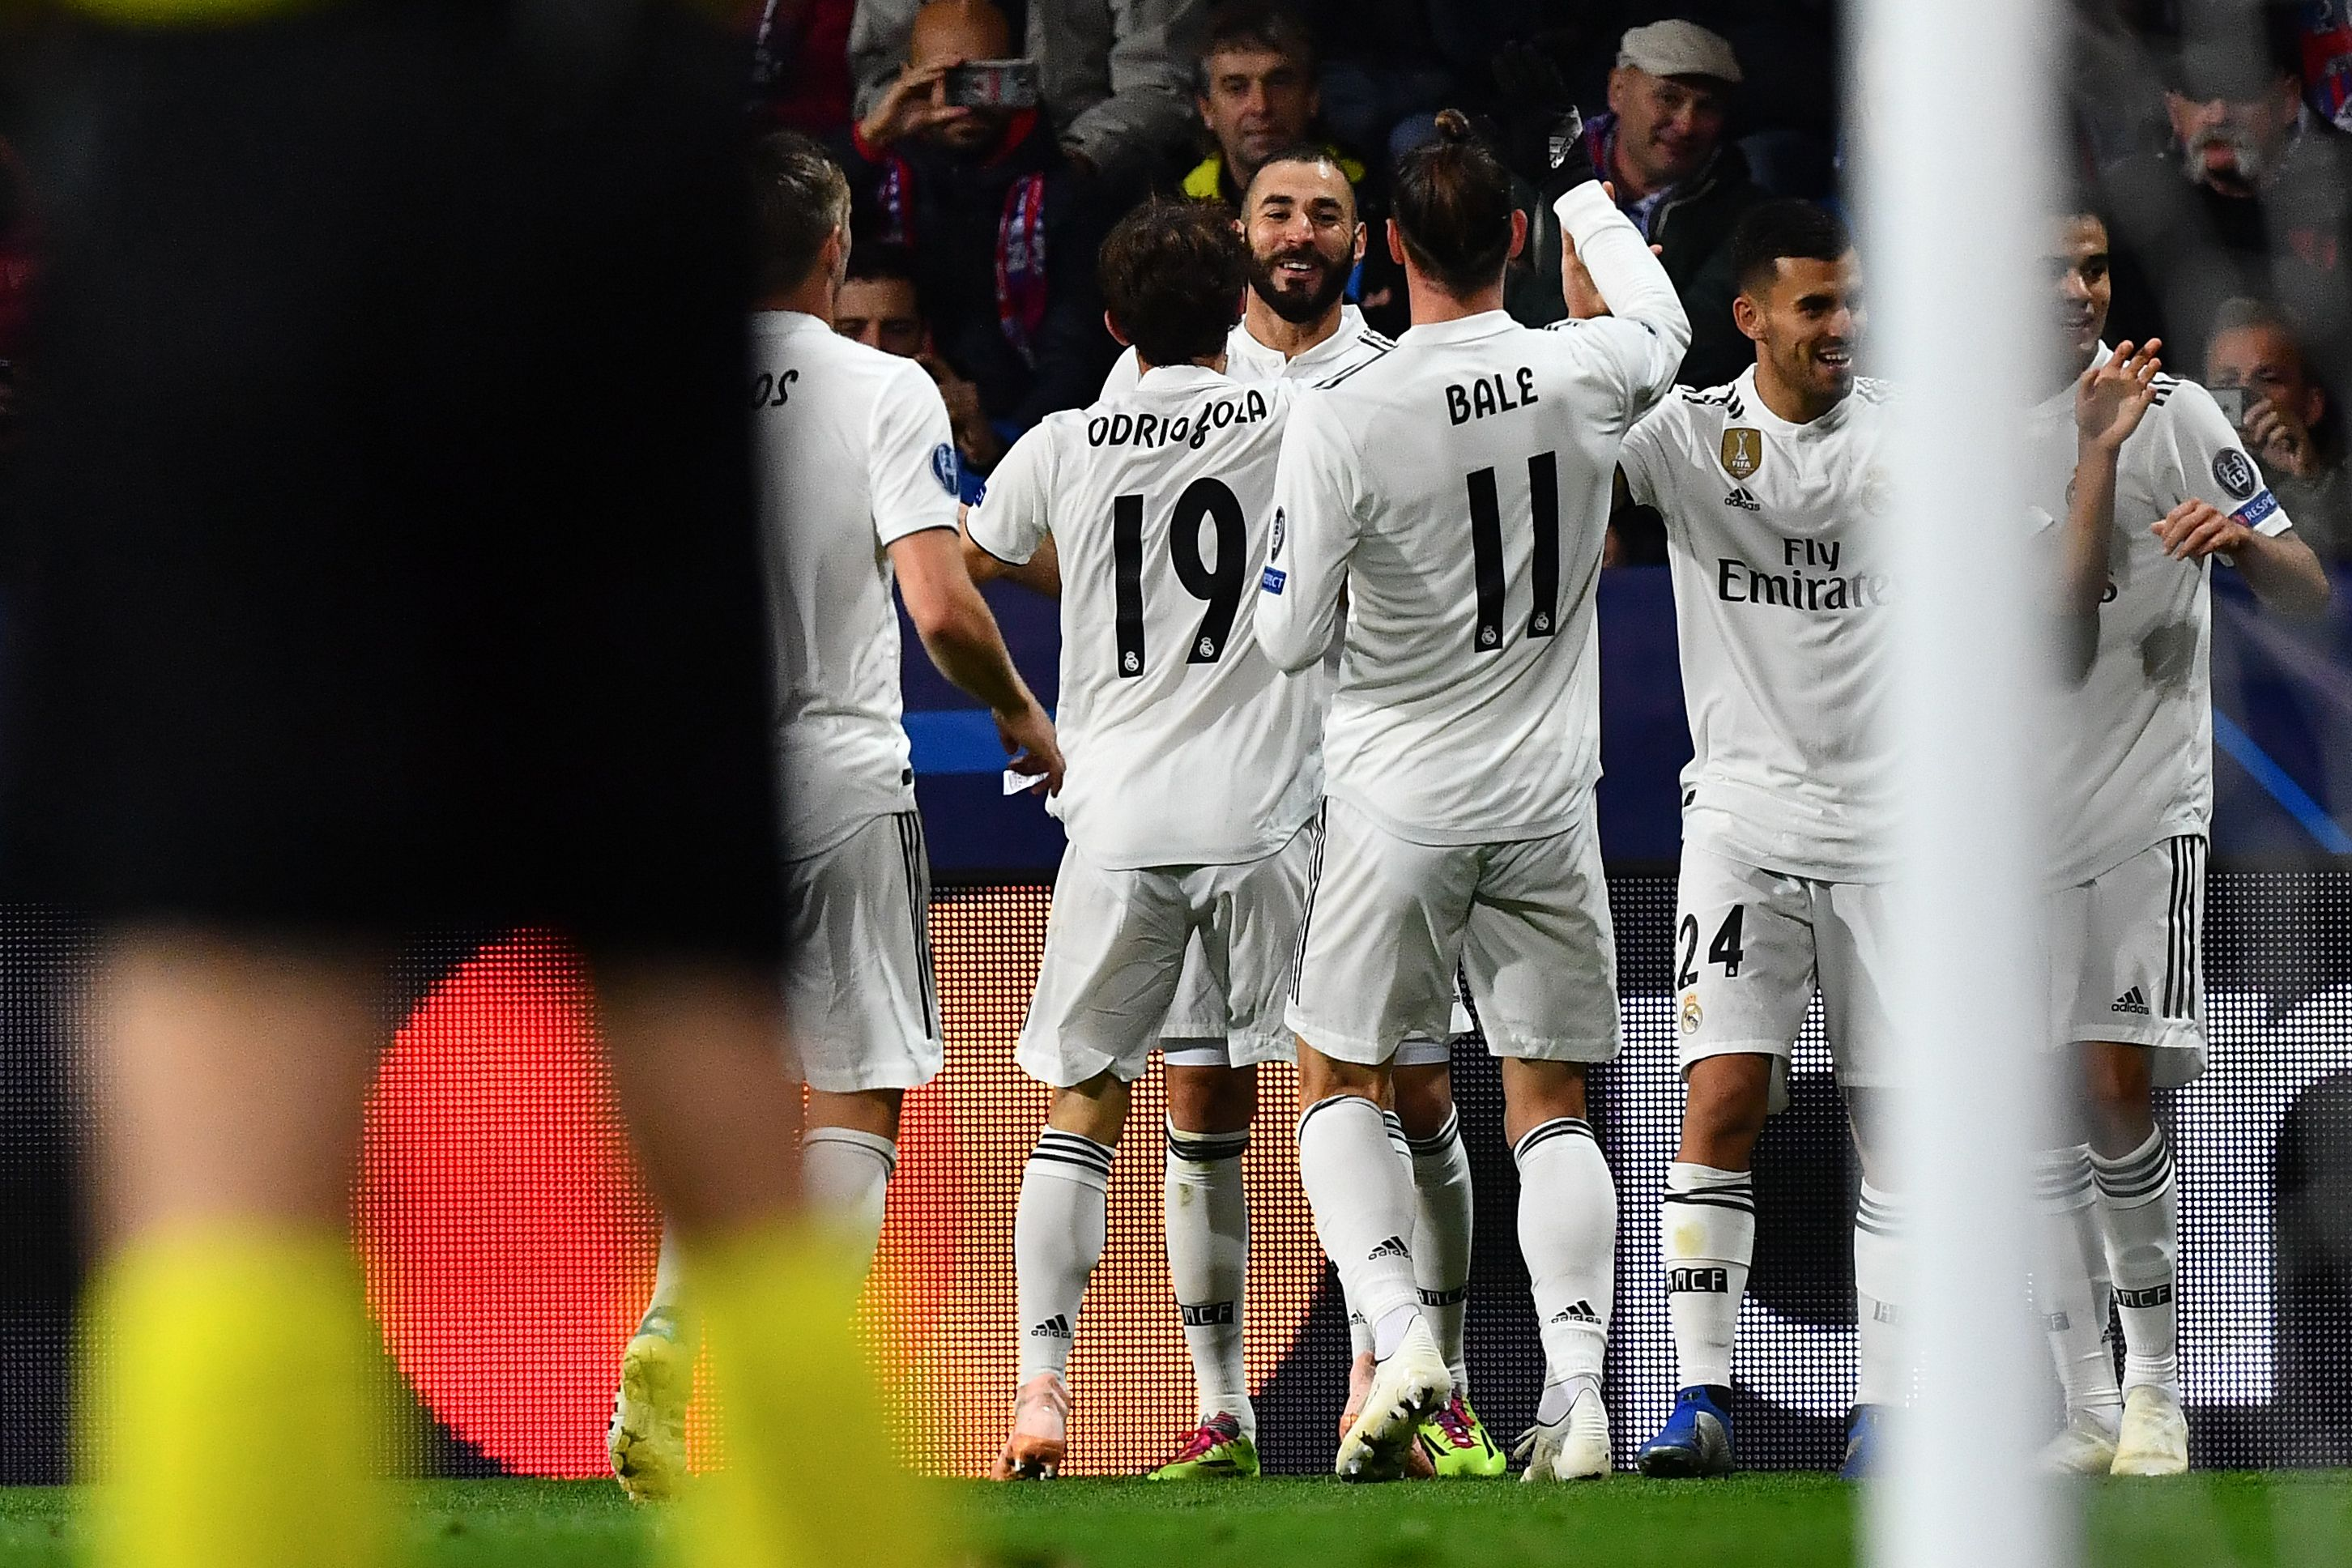 Real Madrid Viktoria Plzen Champions League 2018-2019